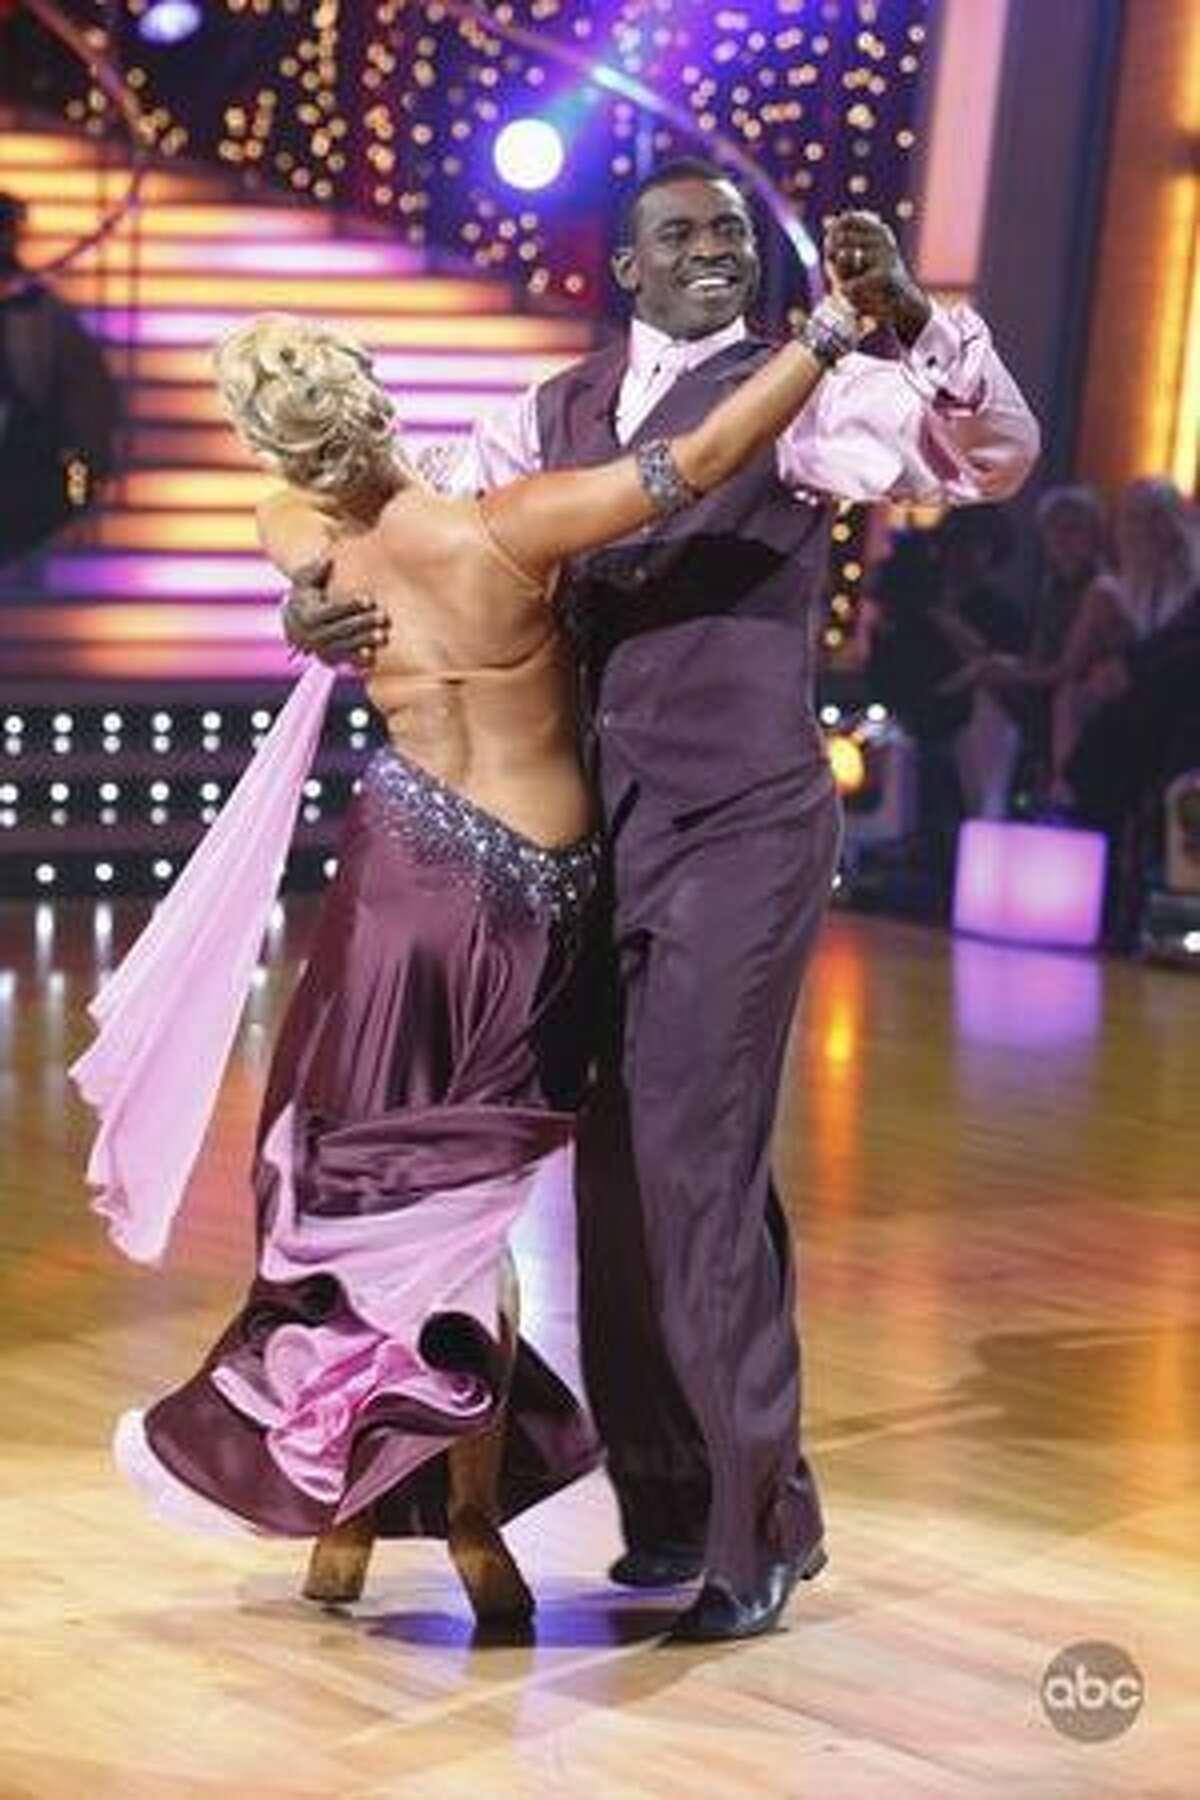 Professional dancer Anna Demidova and former pro football player Michael Irvin.